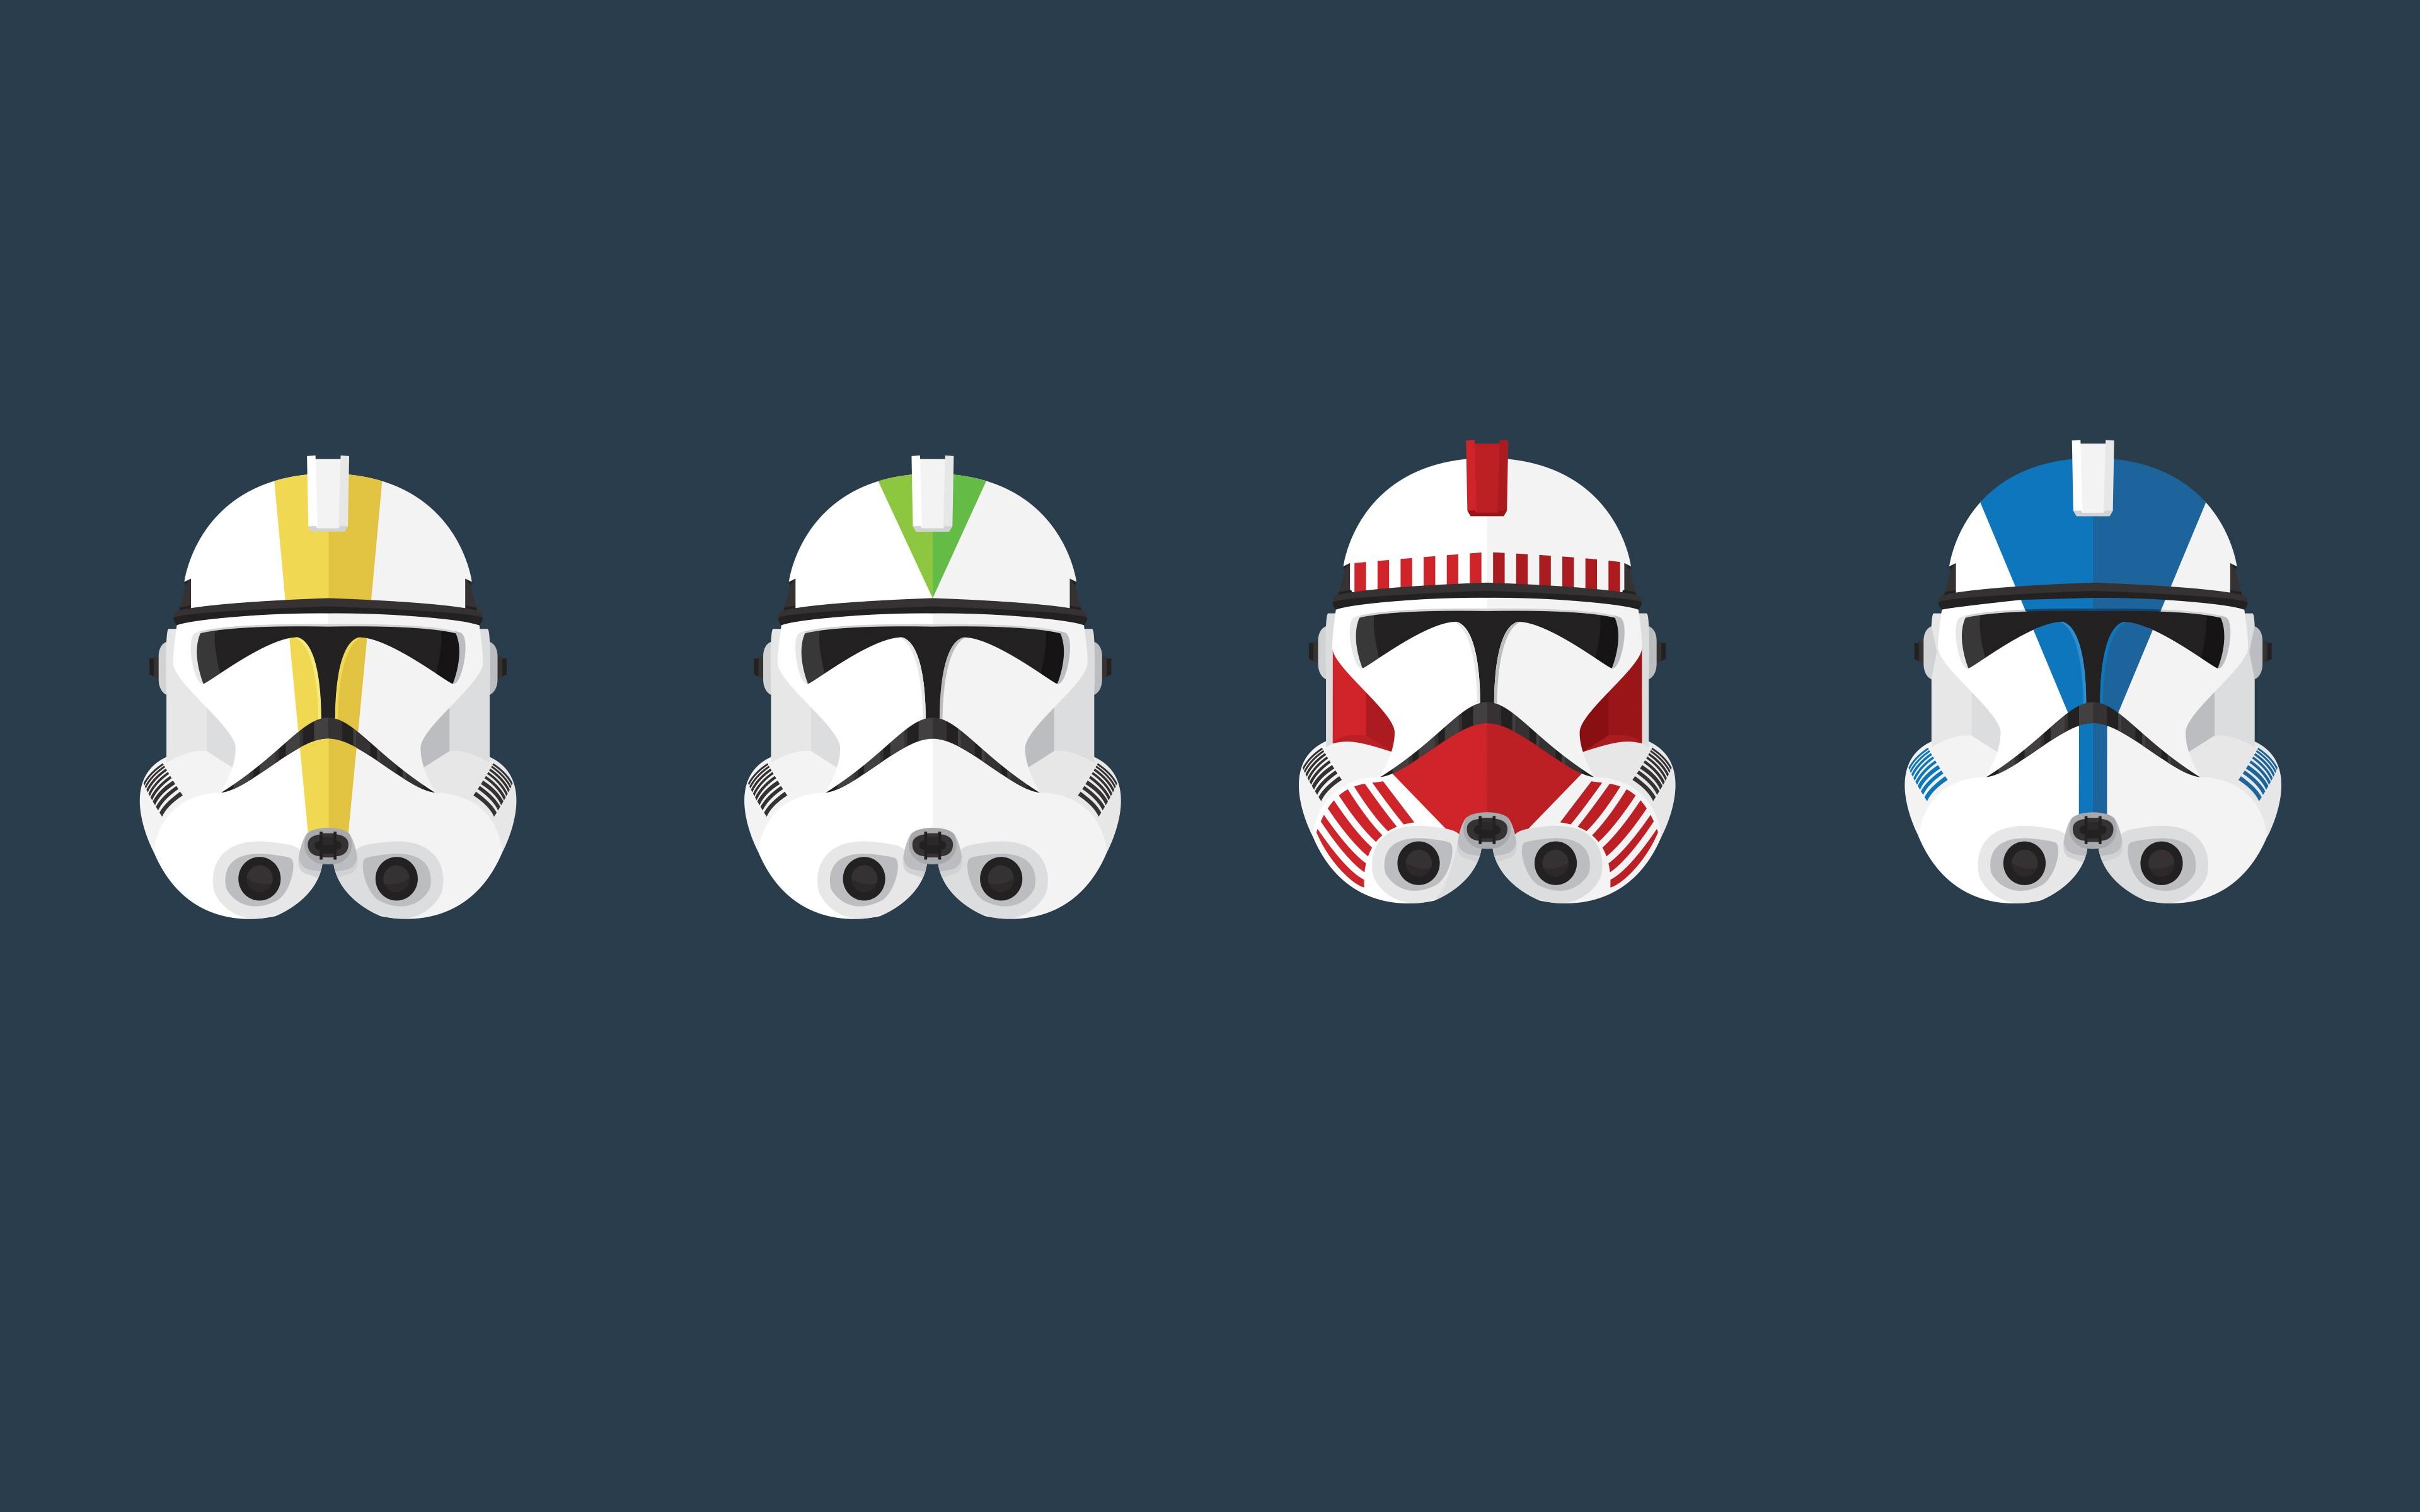 Star Wars Minimalism Logo Graphic Design Helmet Brand Clone Trooper Commander Graphics 3840x2400 Px Computer